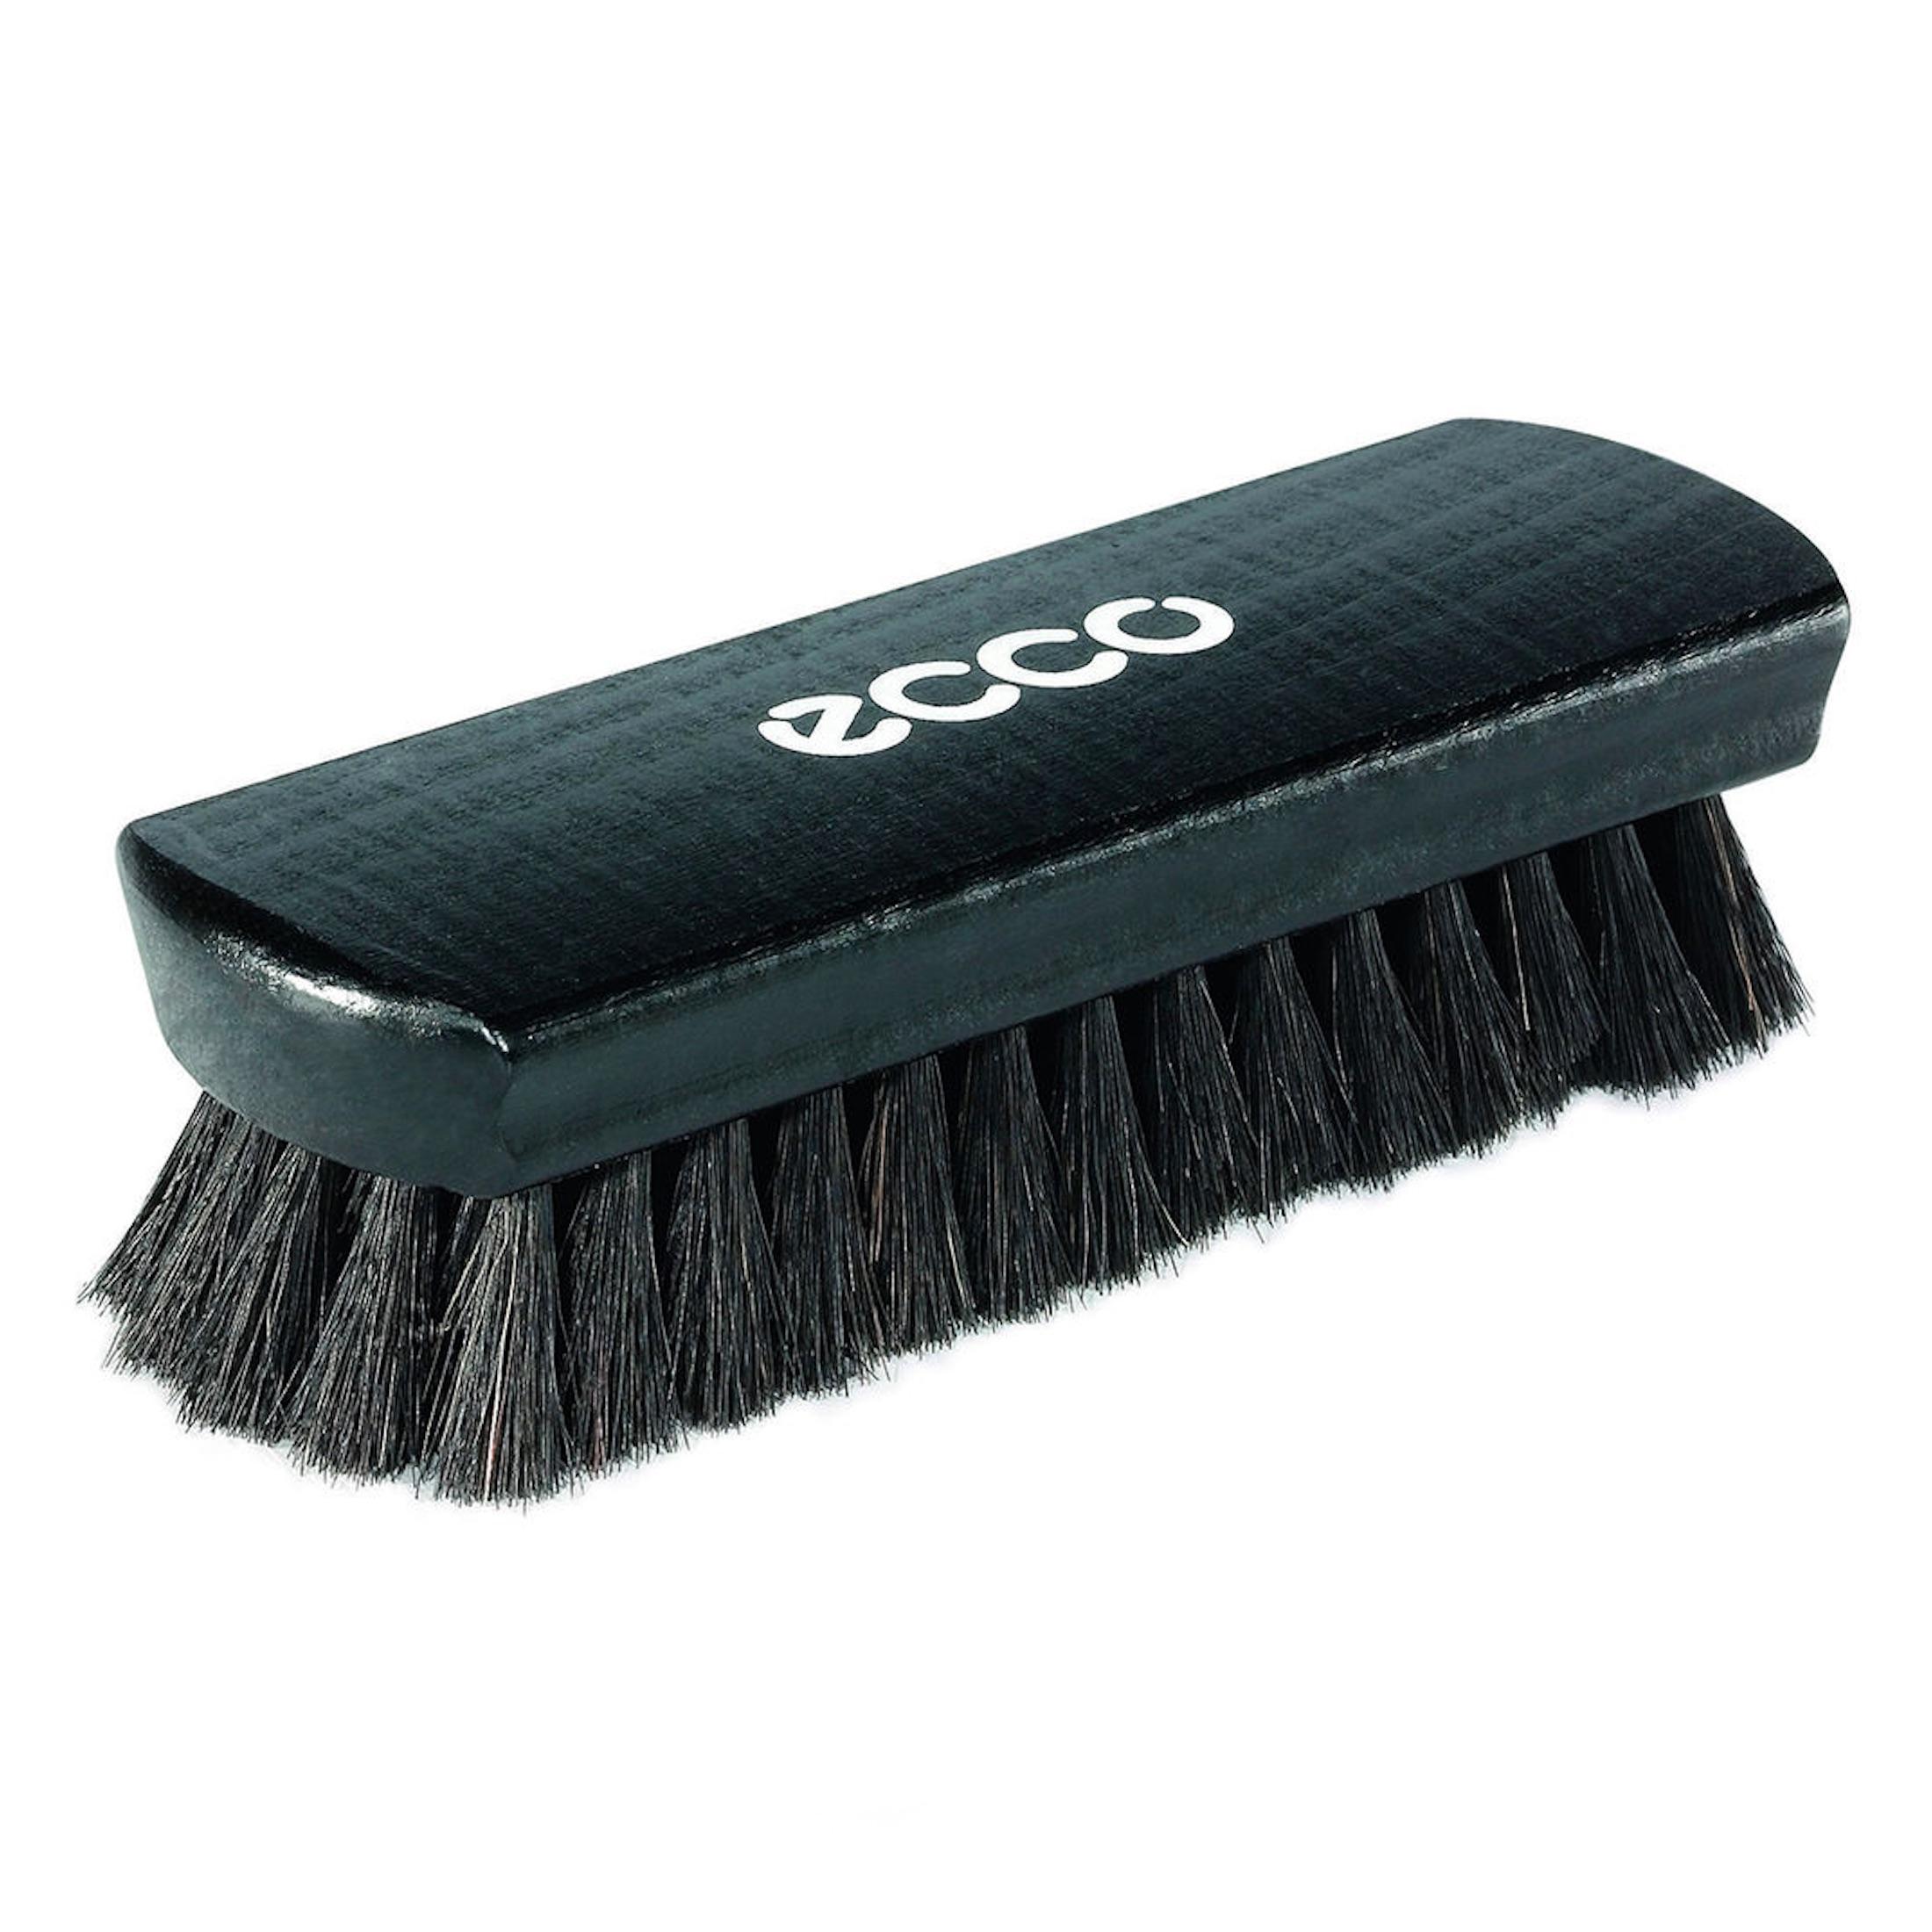 Image of ECCO Shoe Shine Brush